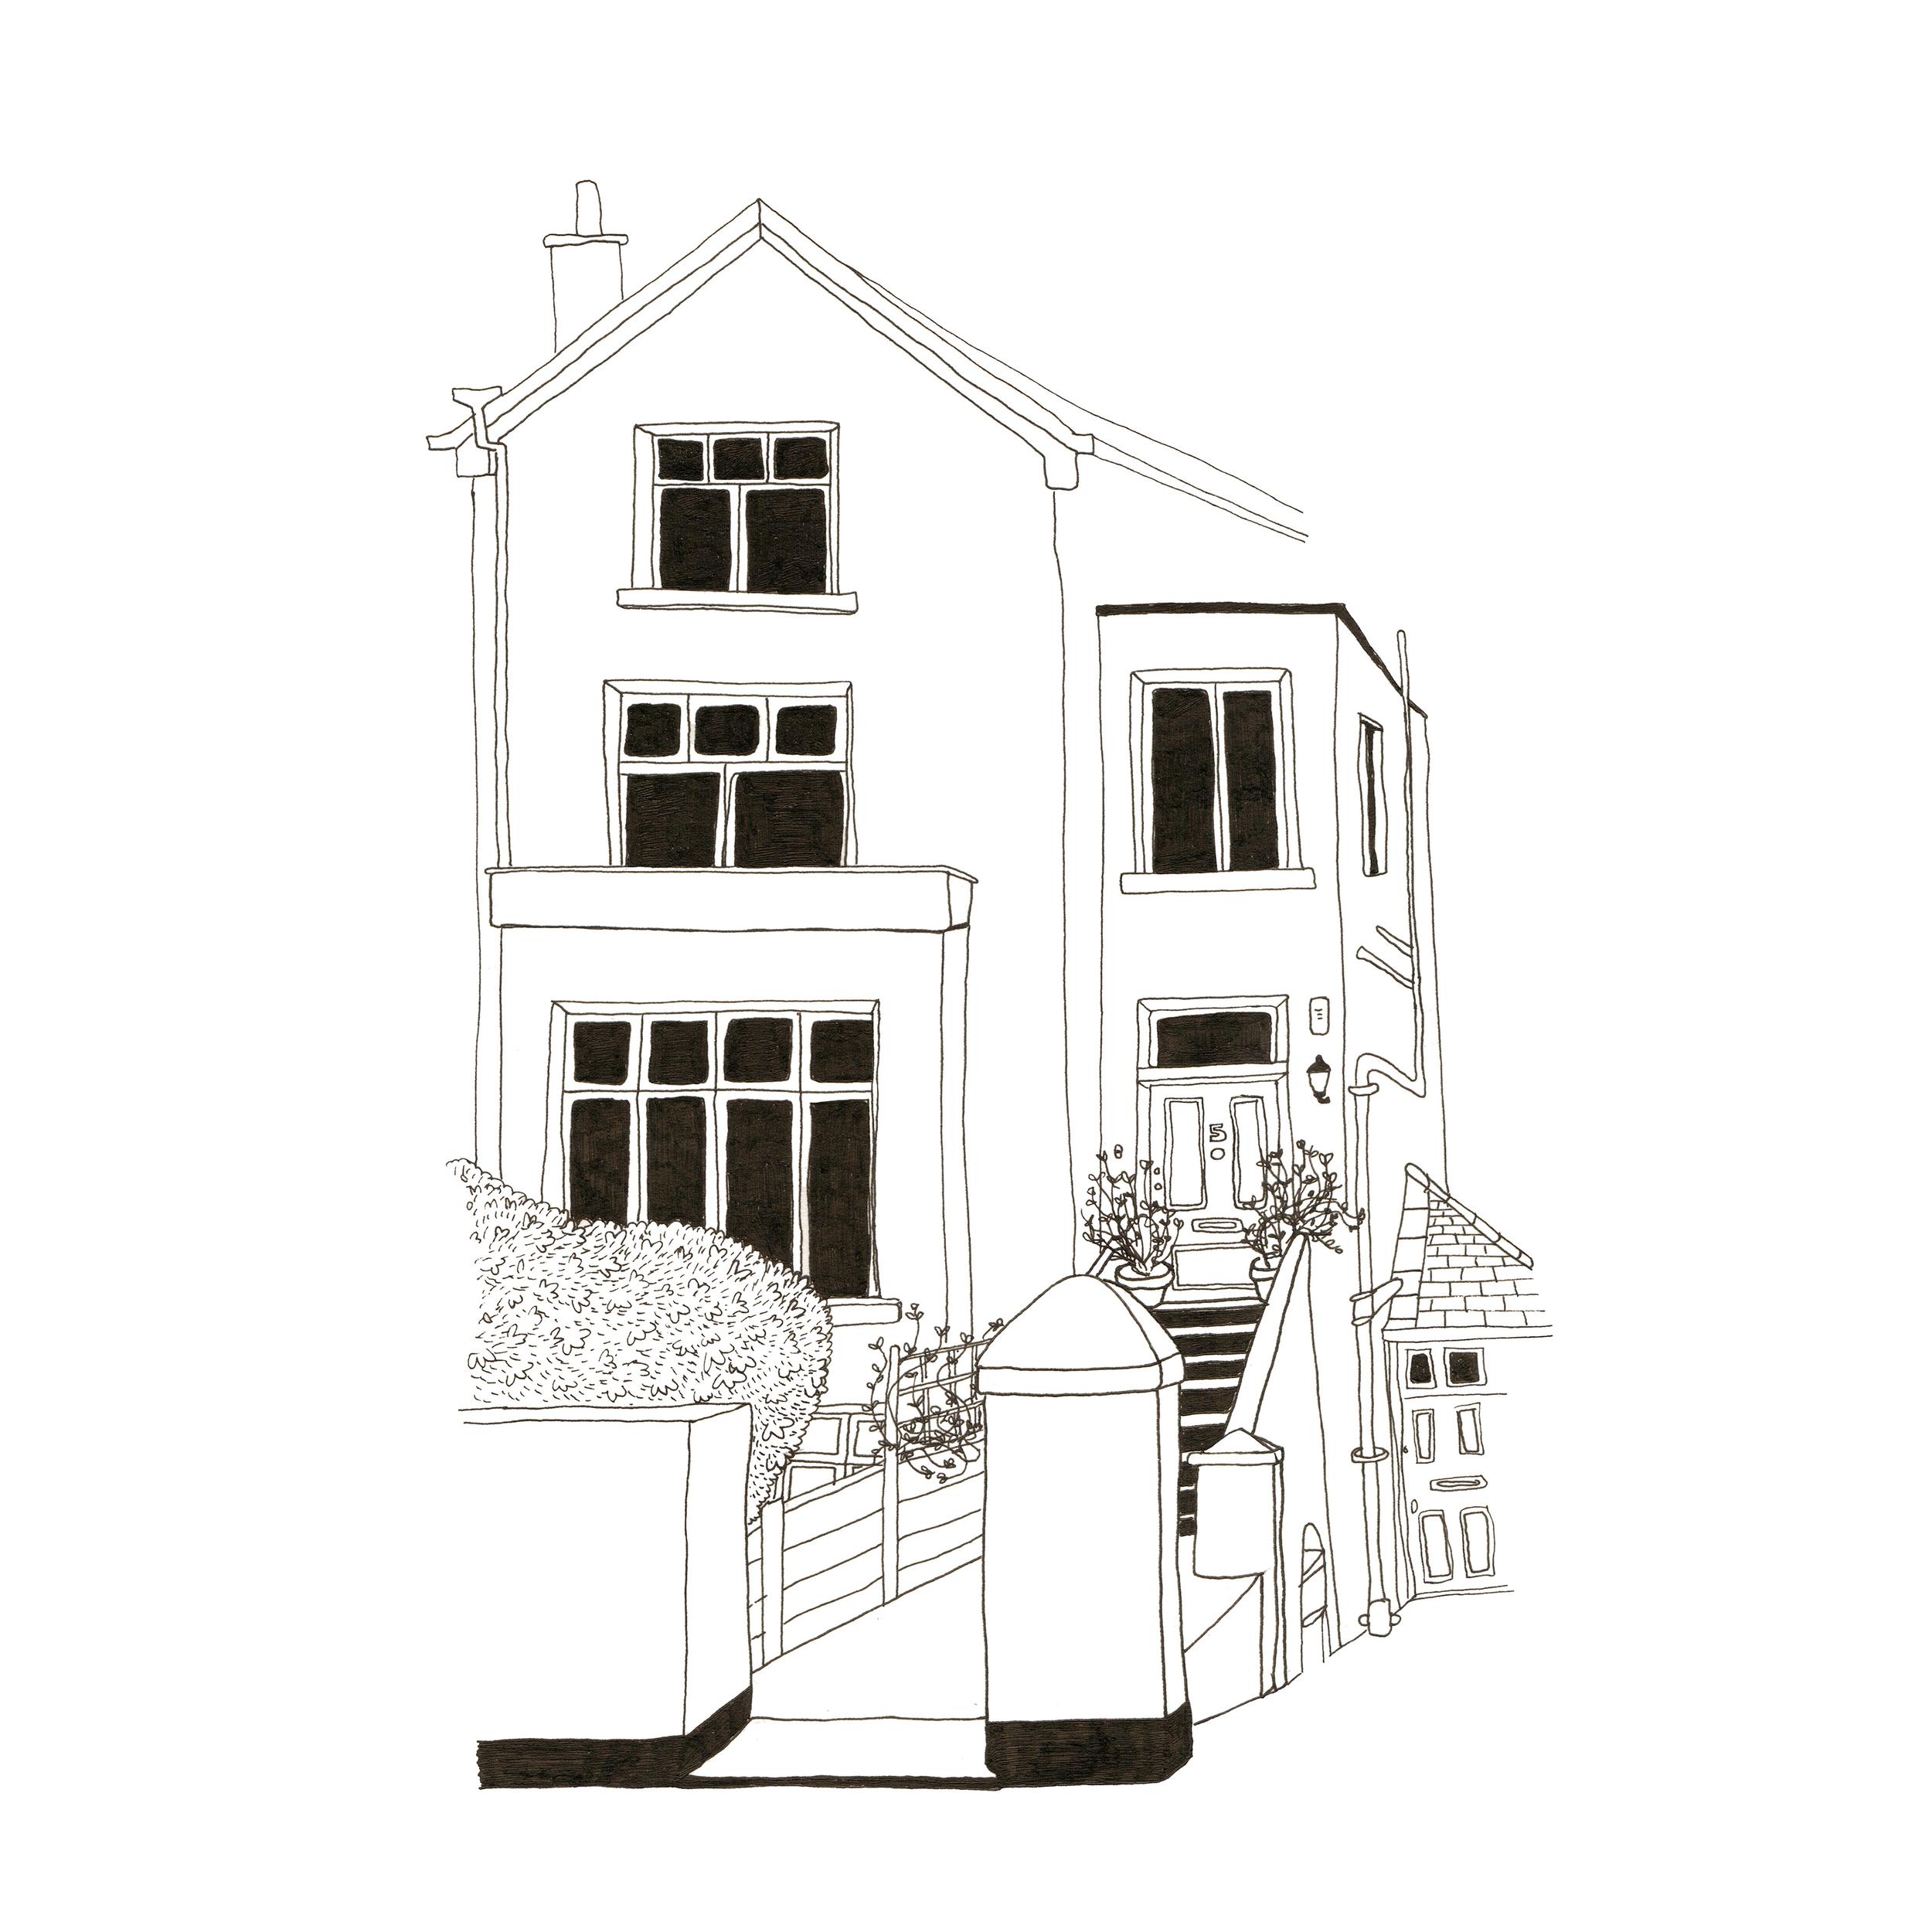 st-stephens-illustration.jpg